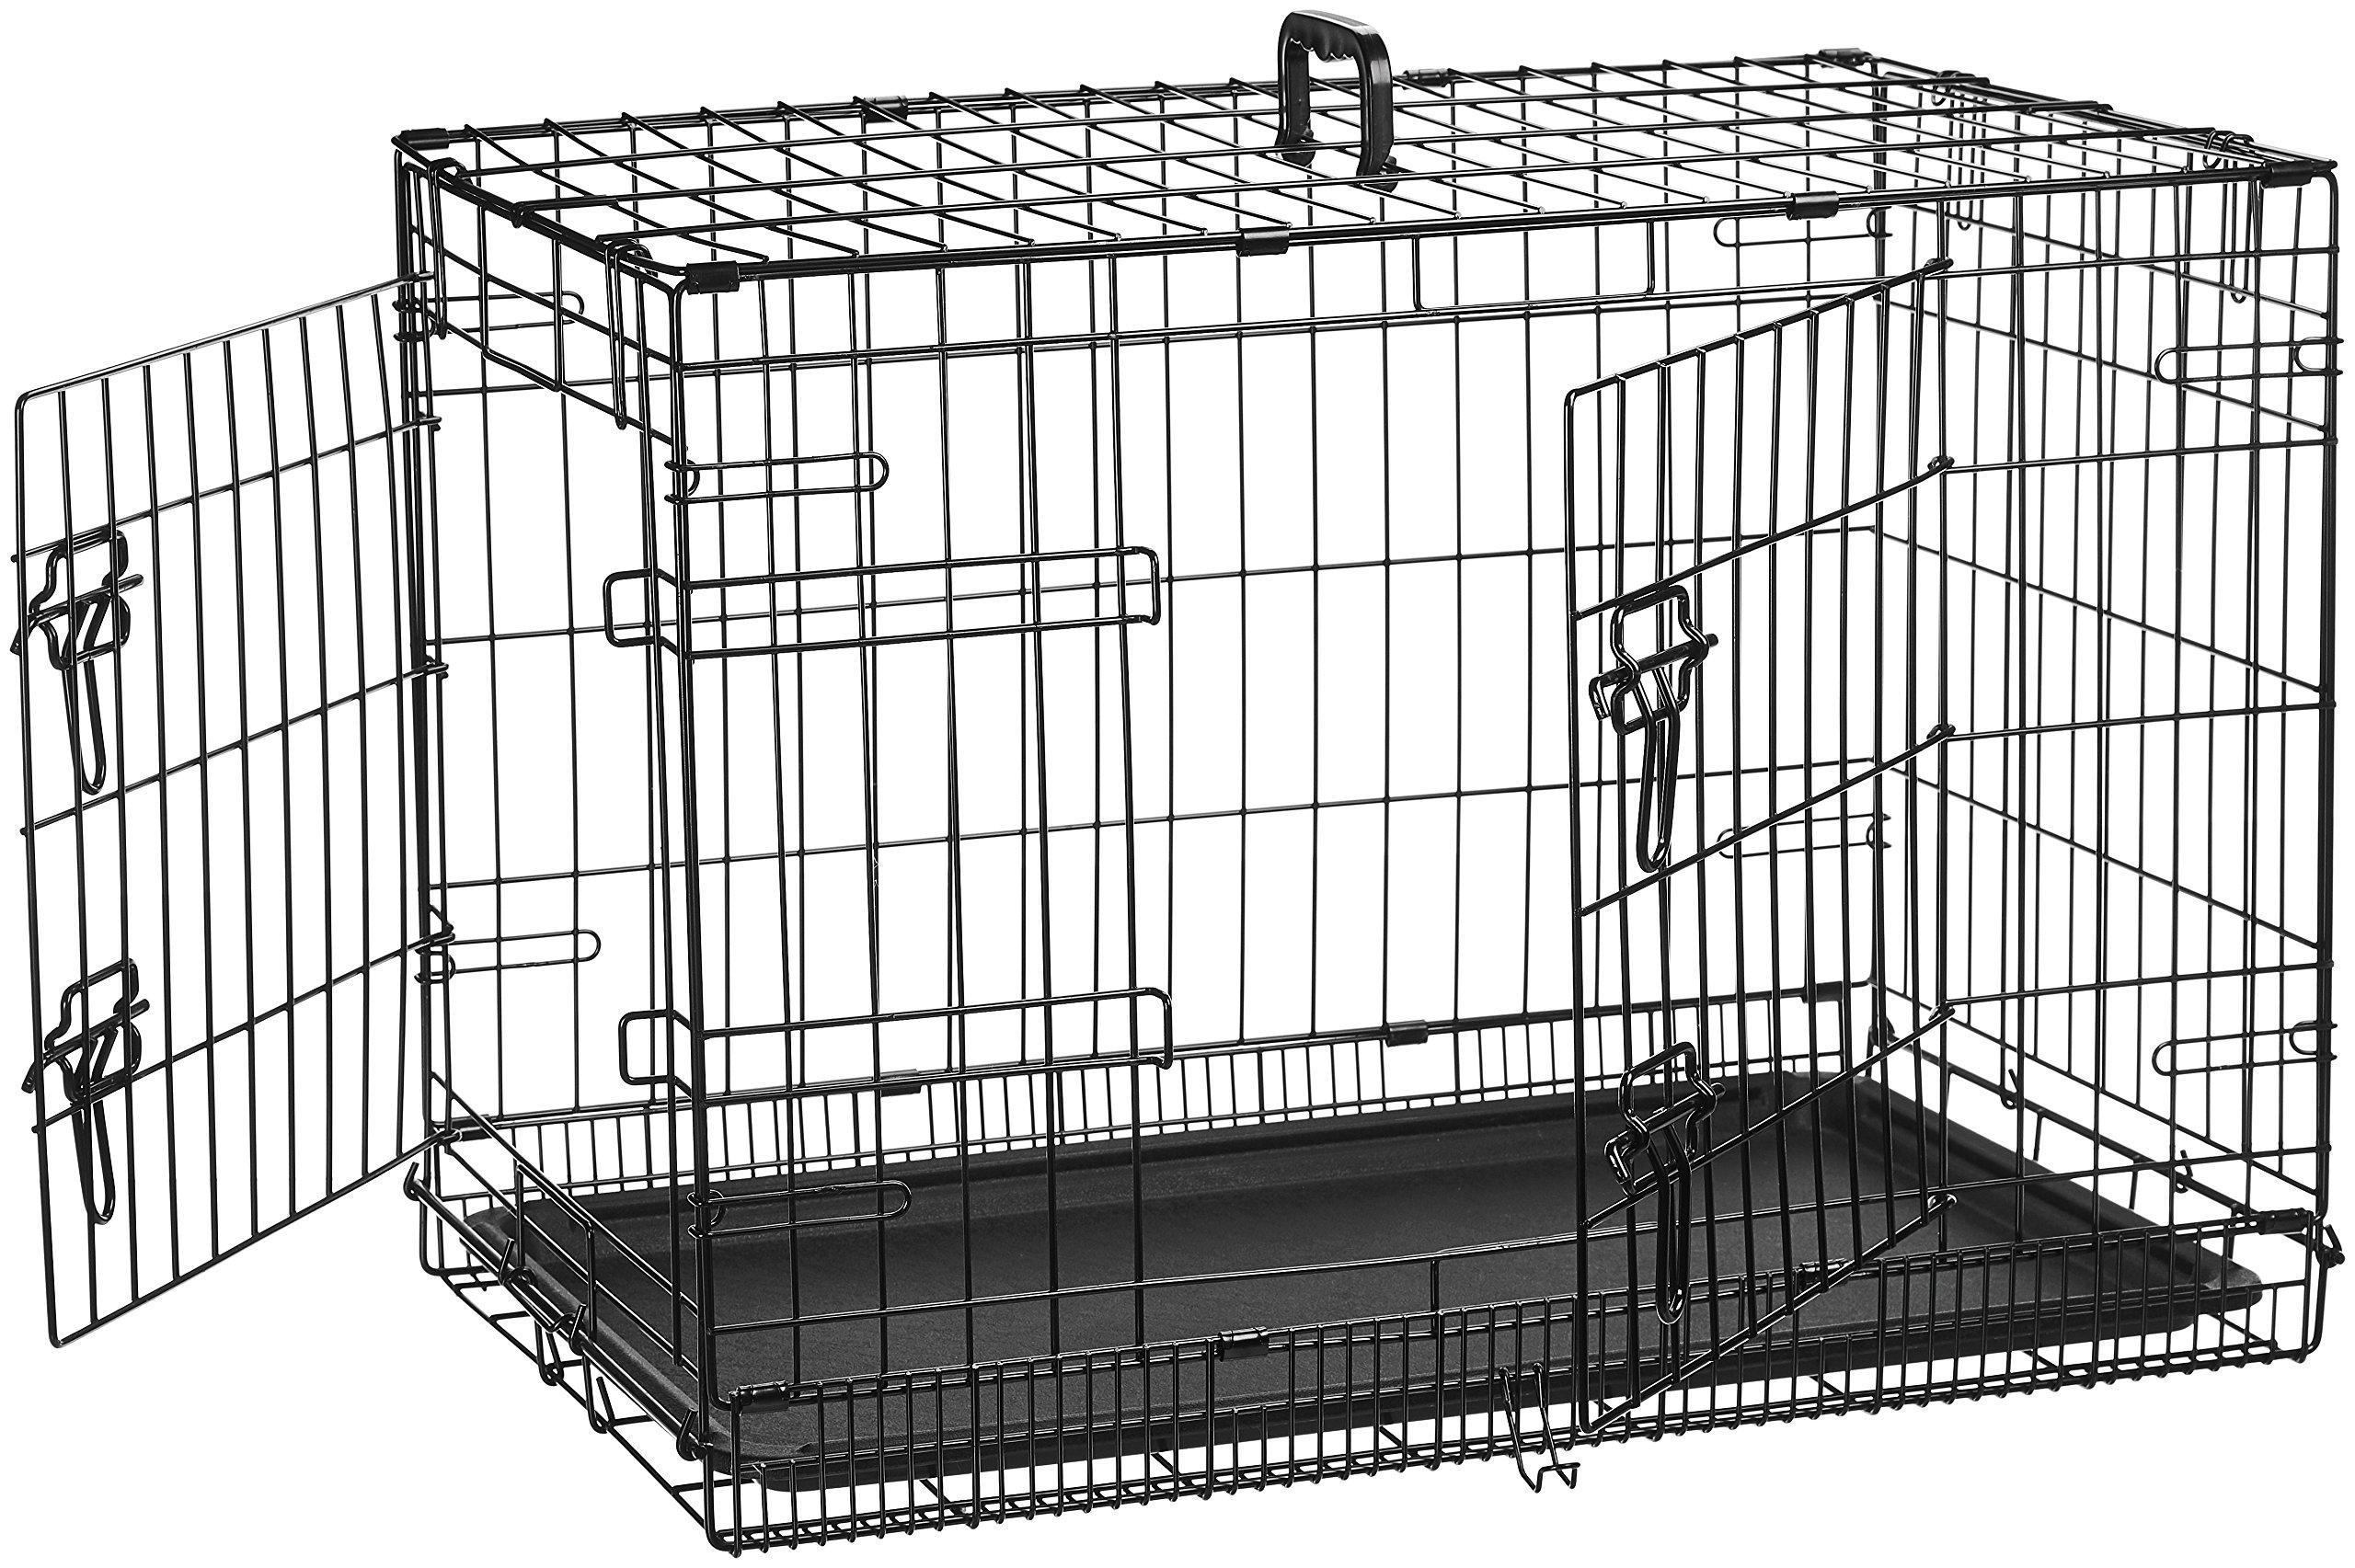 AmazonBasics Double-Door Folding Metal Dog Crate Cage - 30 x 19 x 21 Inches by AmazonBasics